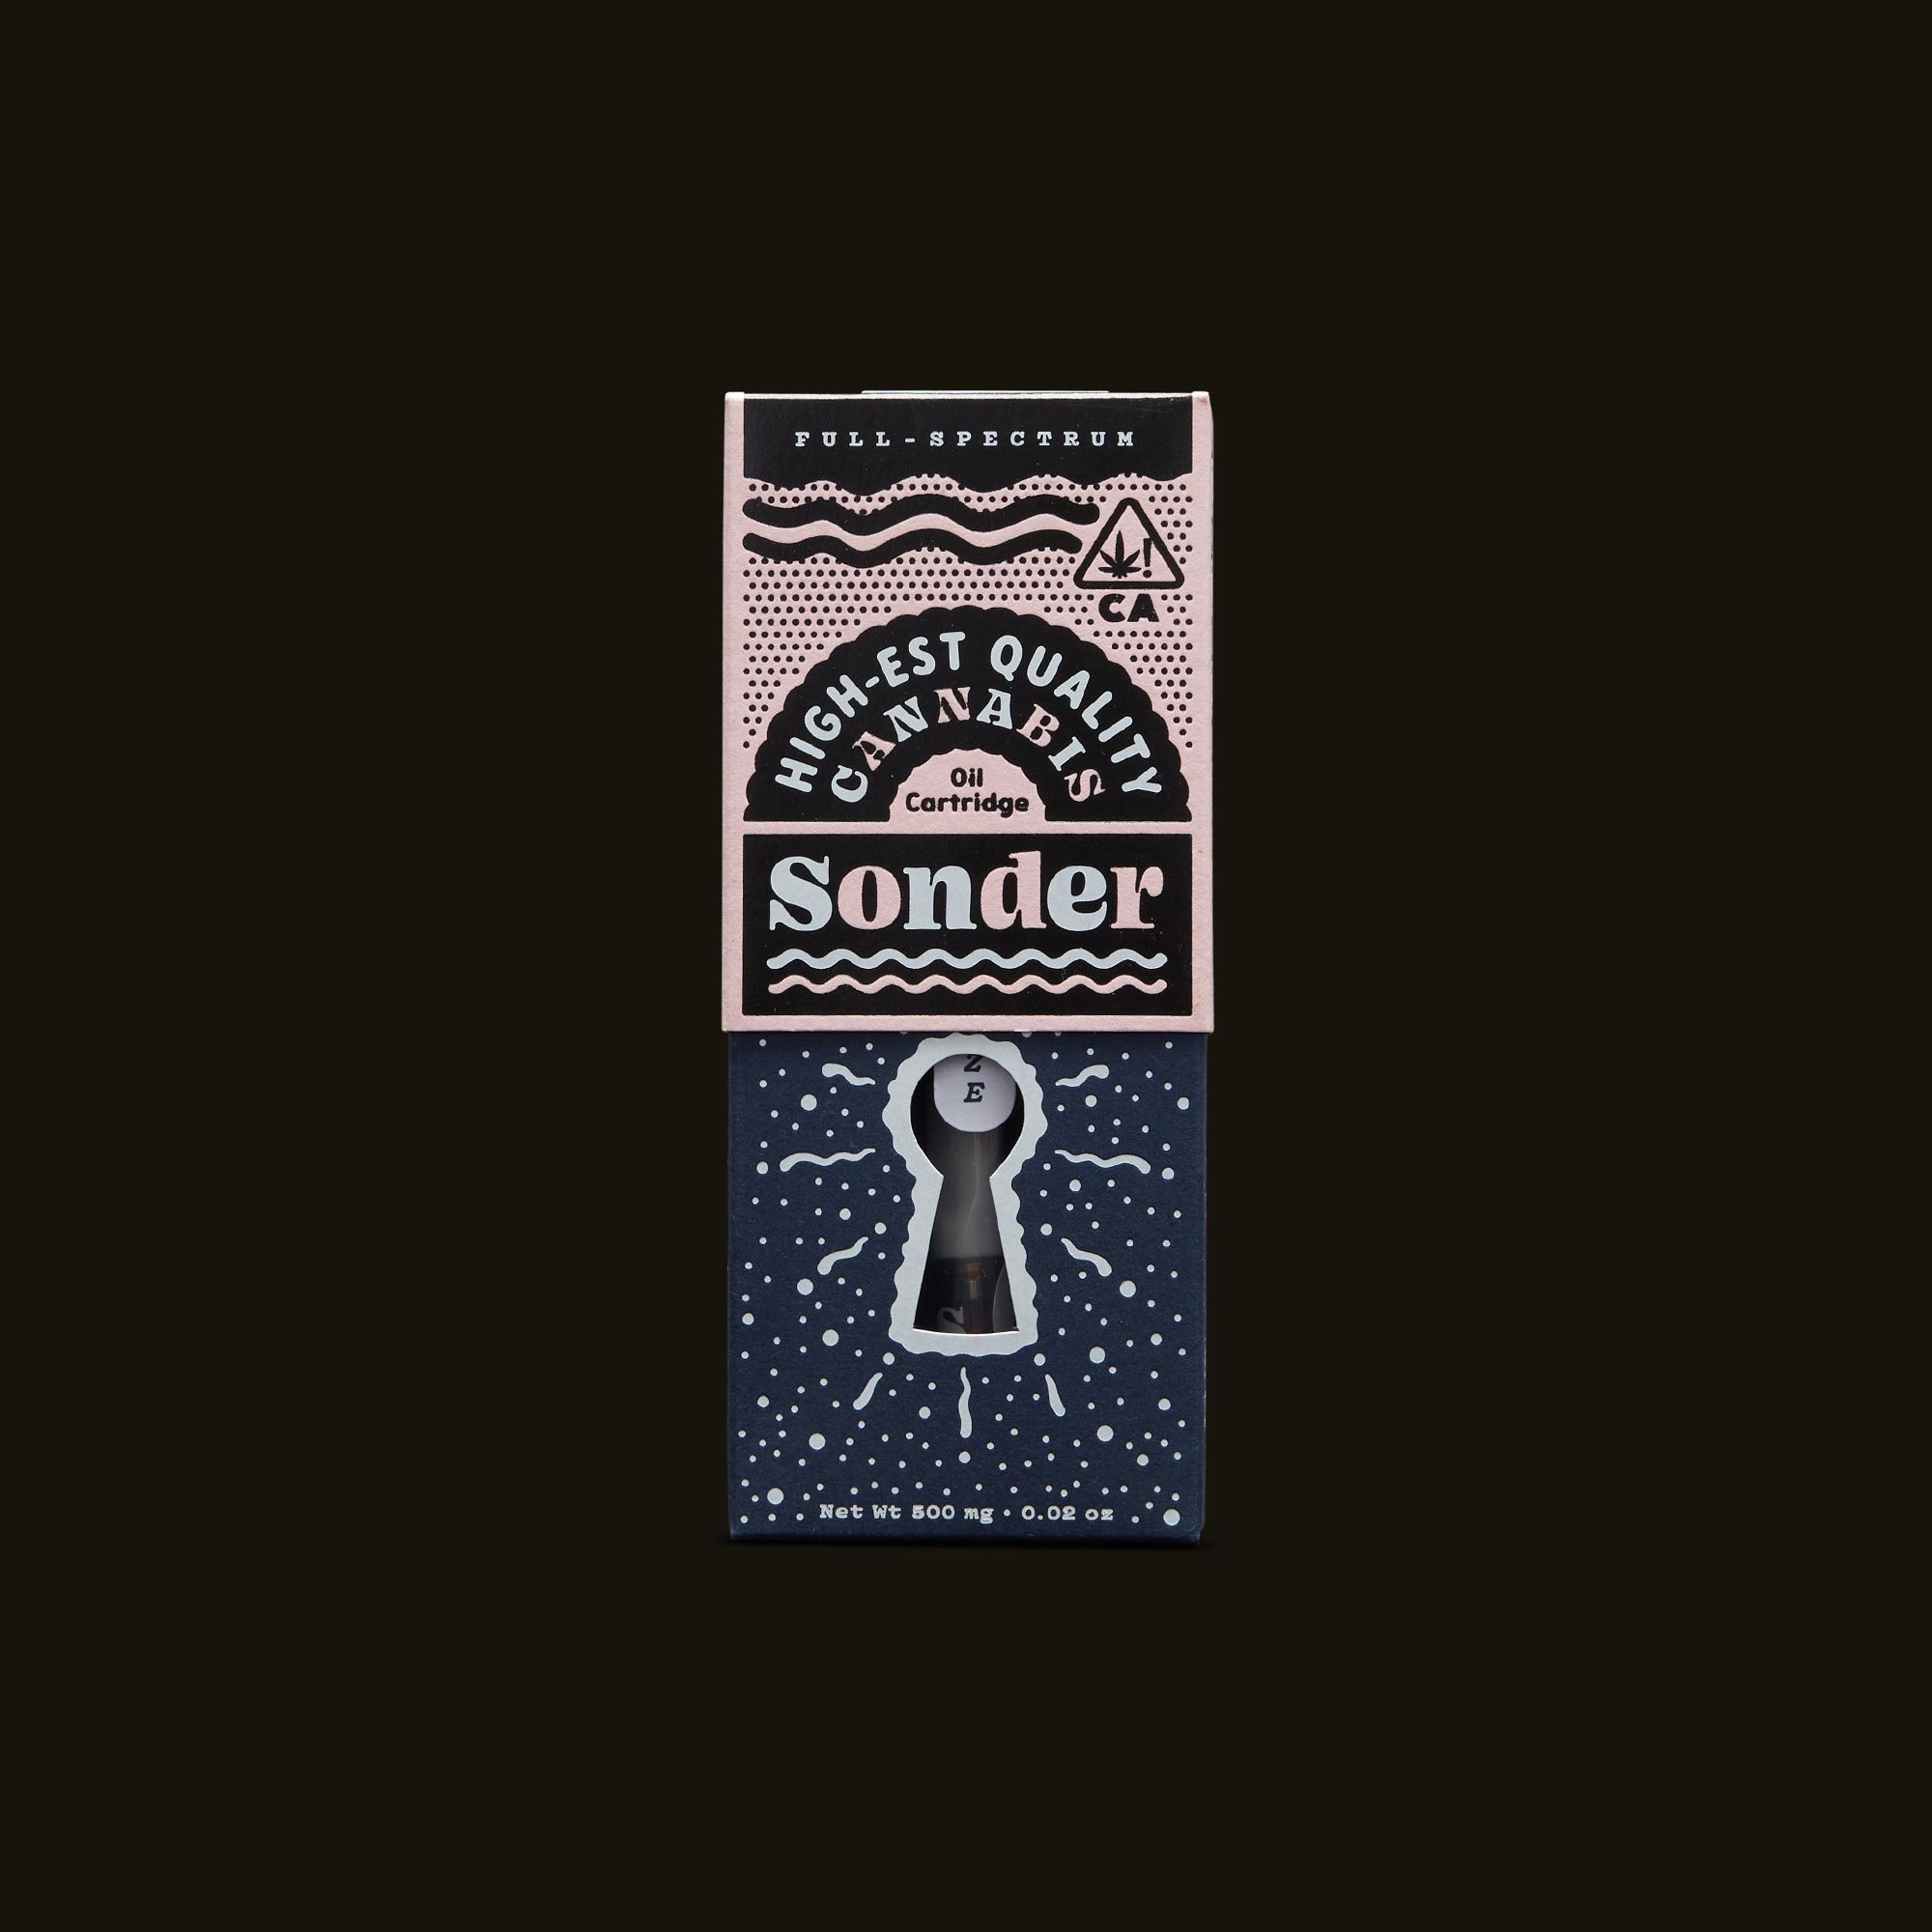 Strong Vape Pen by Sonder